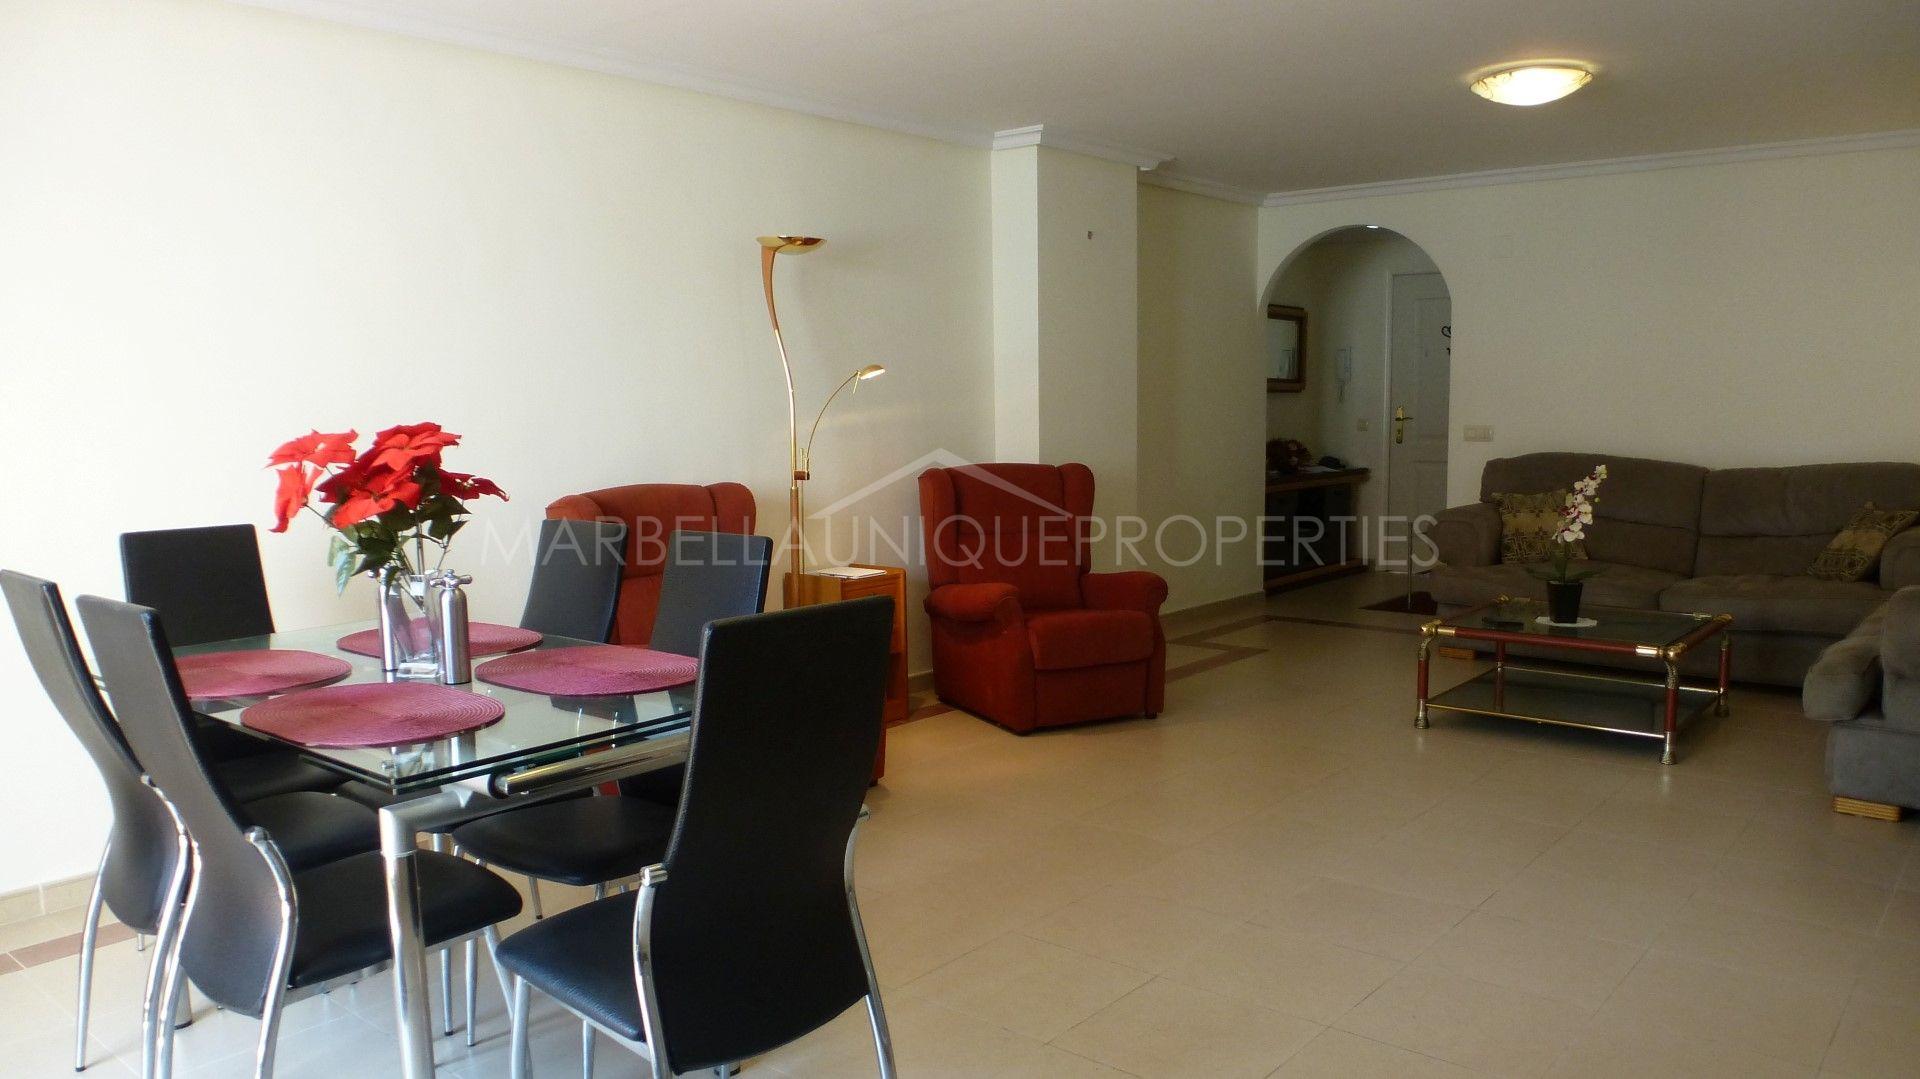 An Ideal 2 Bedroom Apartment In La Maestranza Nueva Andalucia